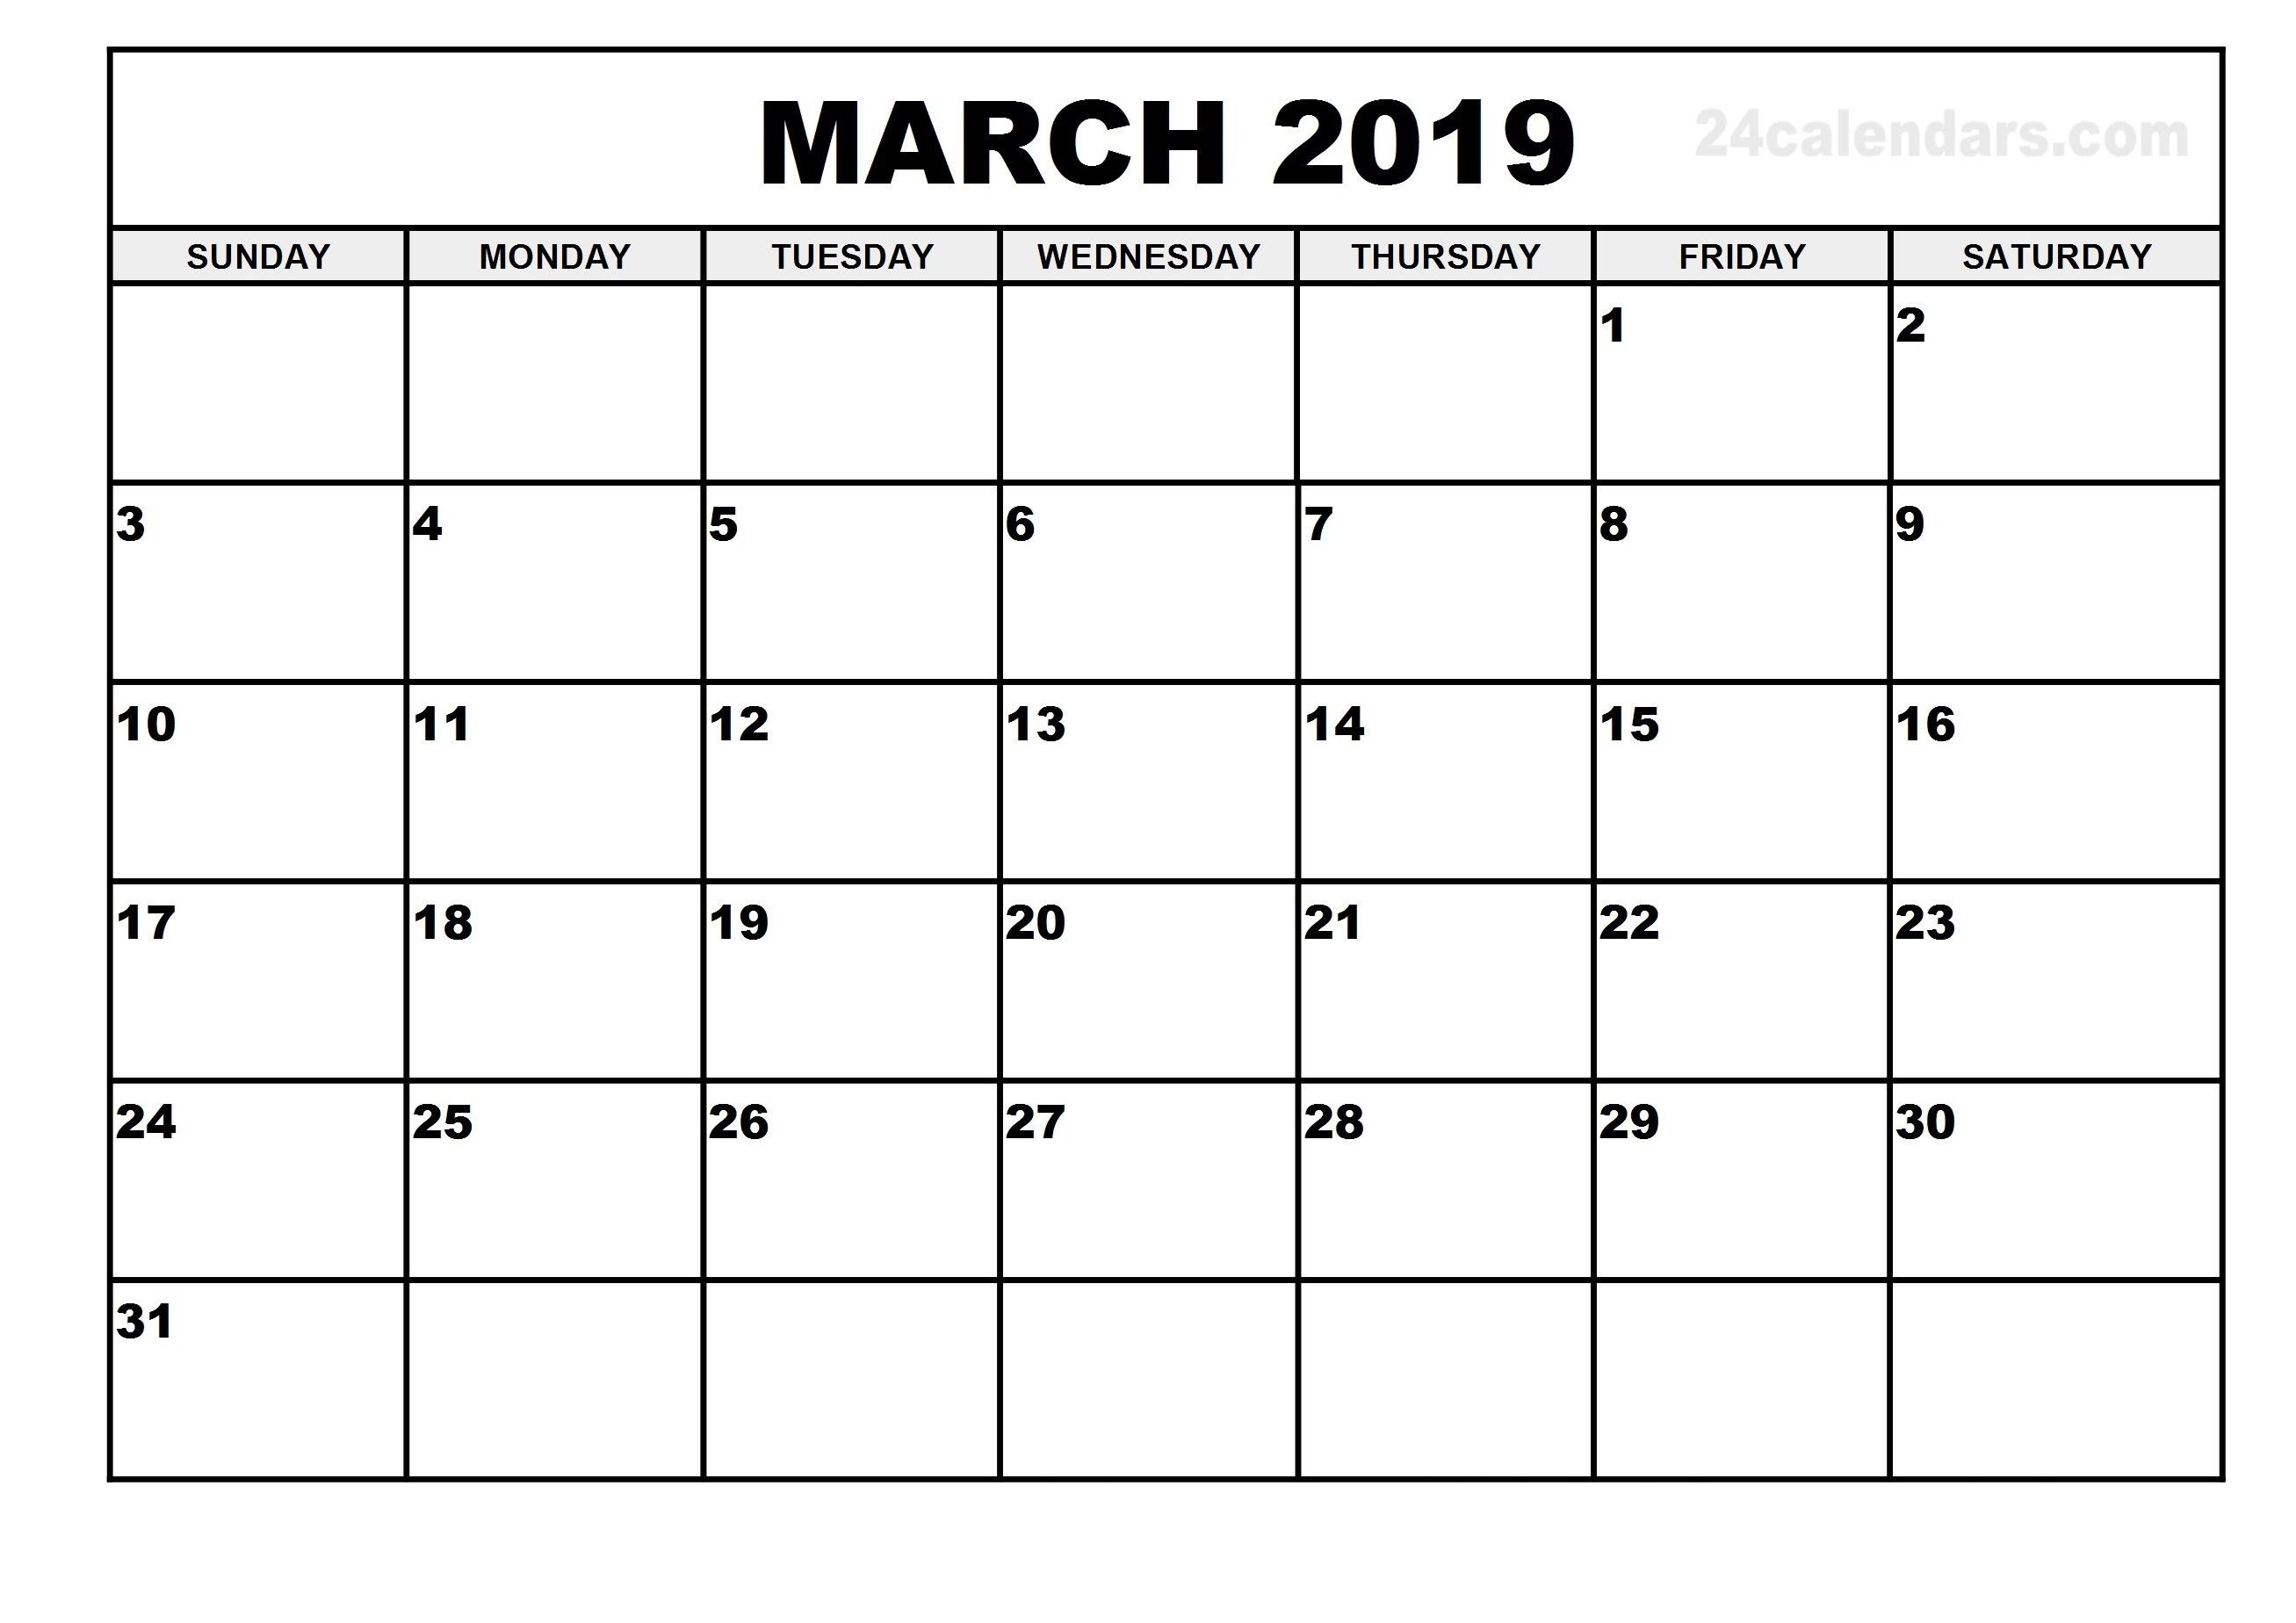 March 1 2019 Calendar | Calendar Format Example March 1 2019 Calendar